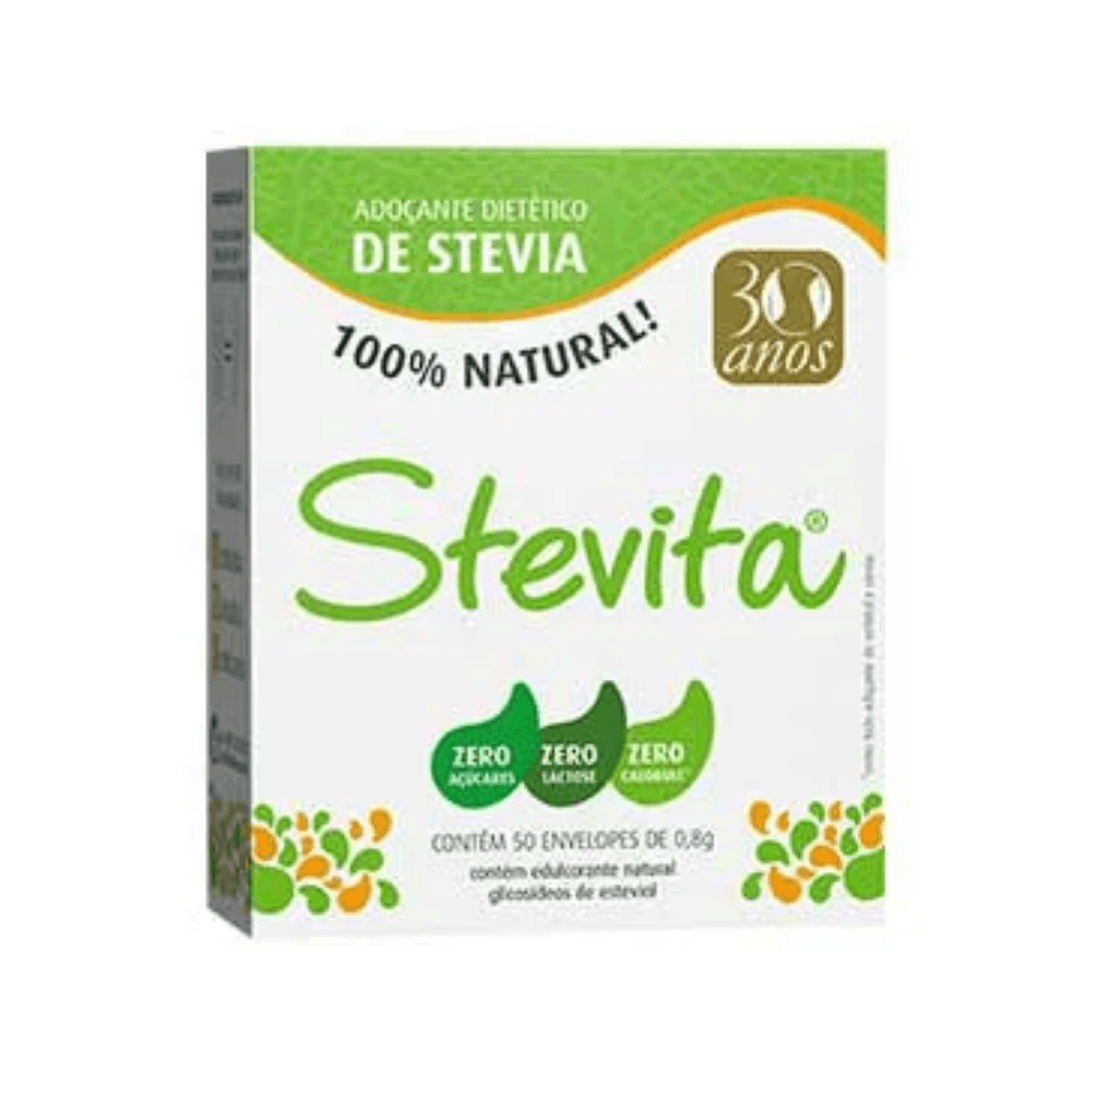 ADOÇANTE STEVIA STEVITA SACHÊ 0,6G CAIXA 50 UNIDADES